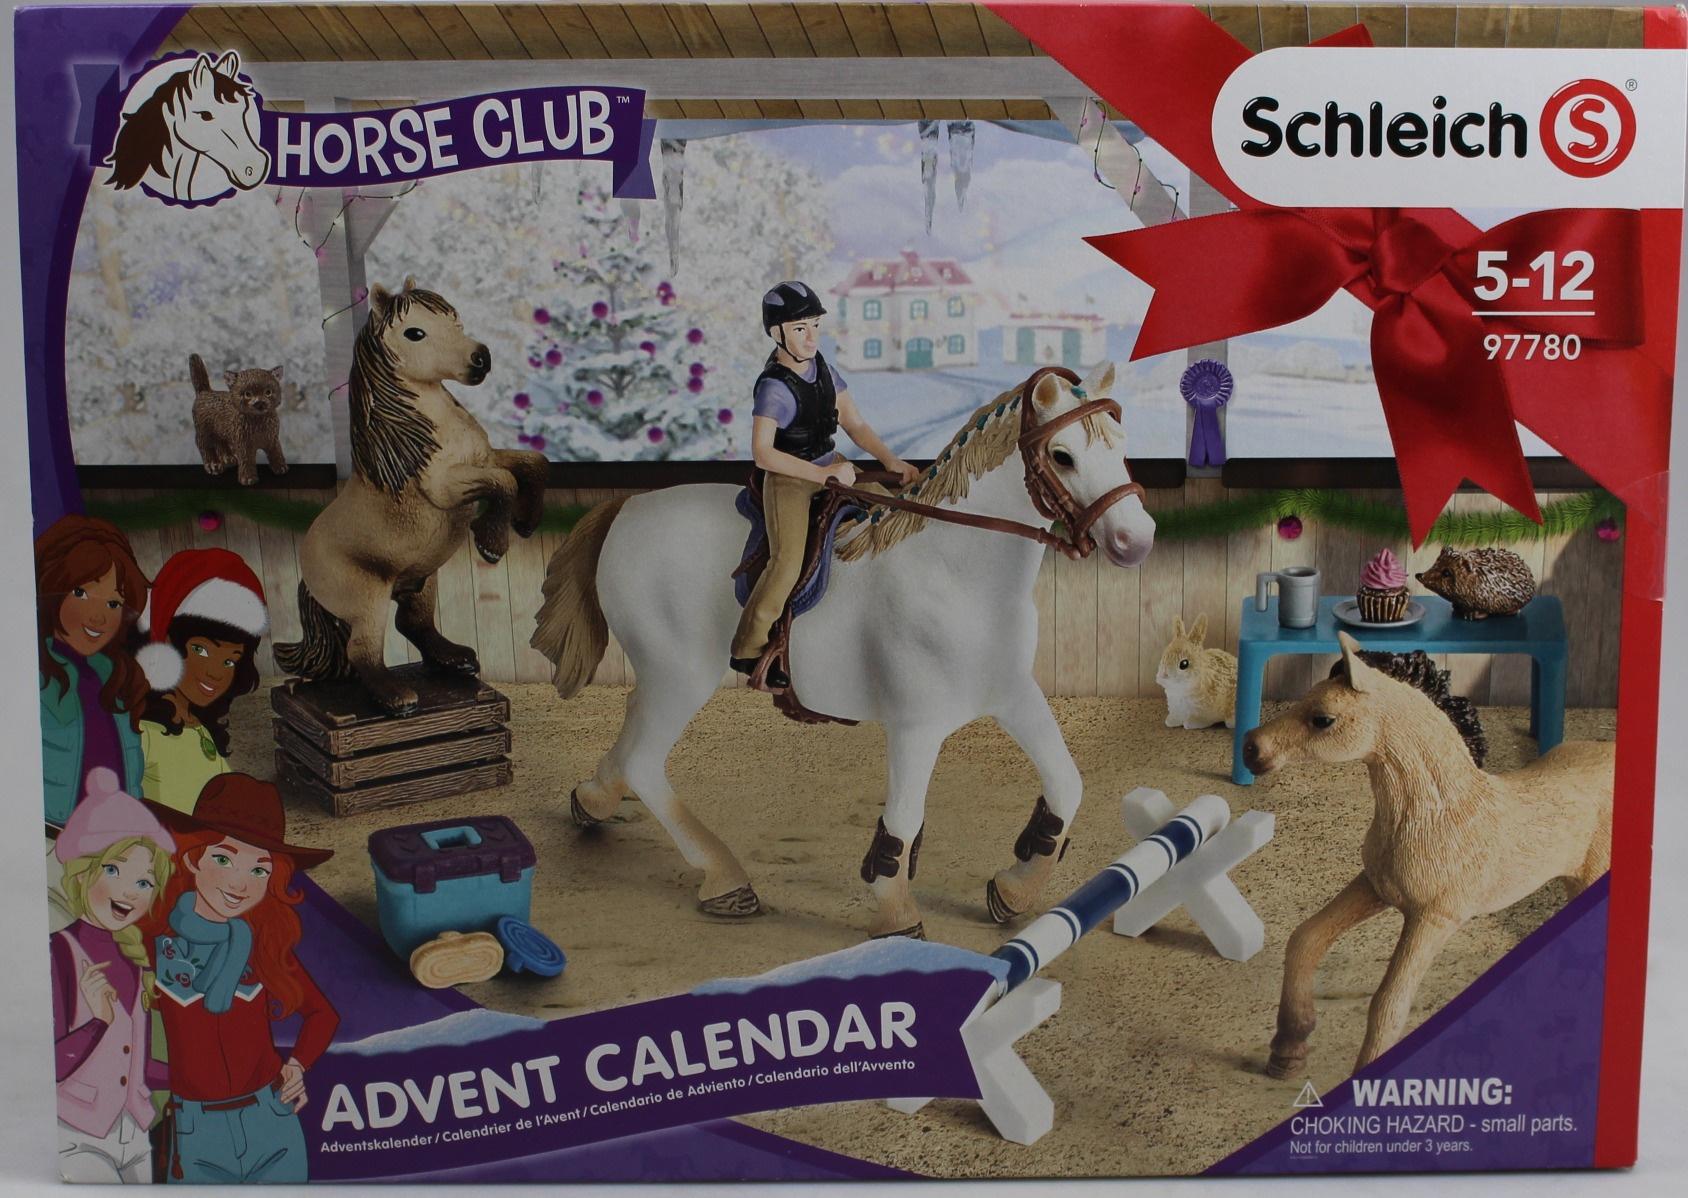 Schleich Horse Club Advent Calendar 2018 Multicolor